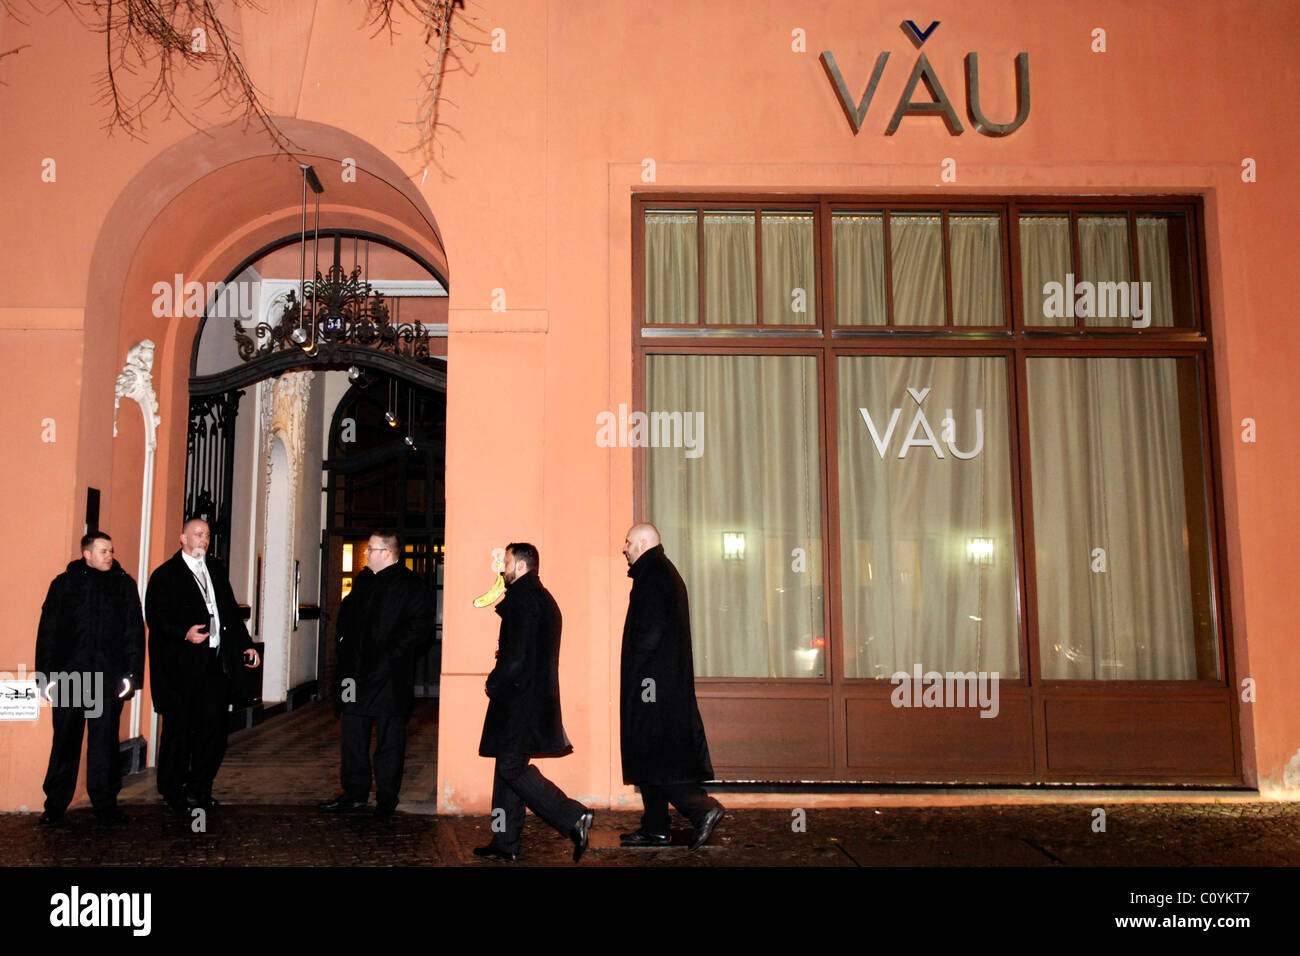 Security At Restaurant VAU Berlin, Germany   19.01.09